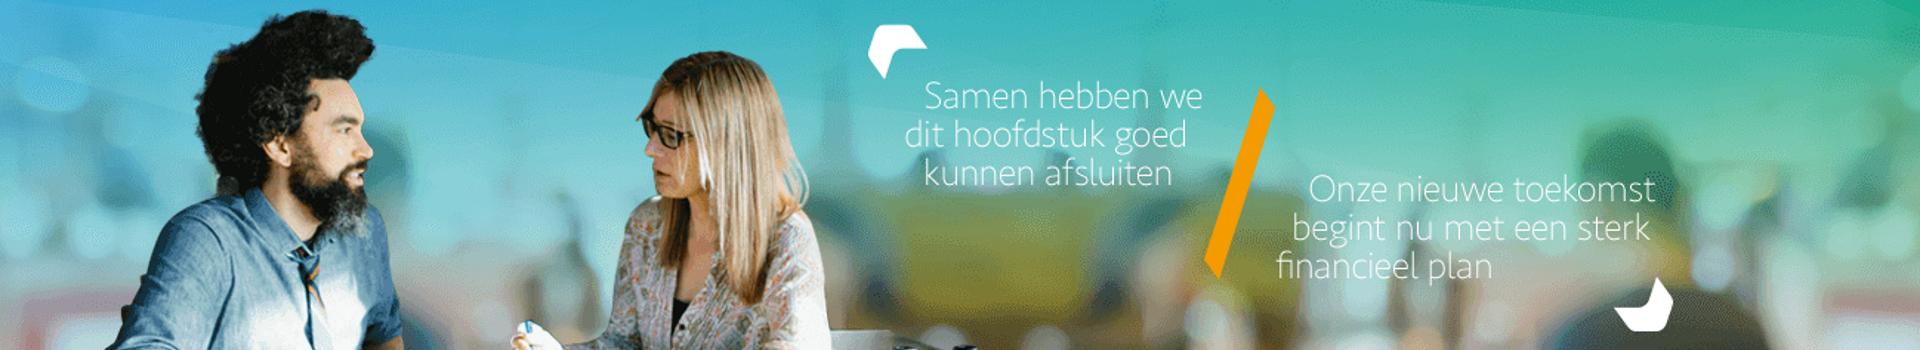 Vestigingen Scheidingsplanner Almelo - Deventer - Nijverdal